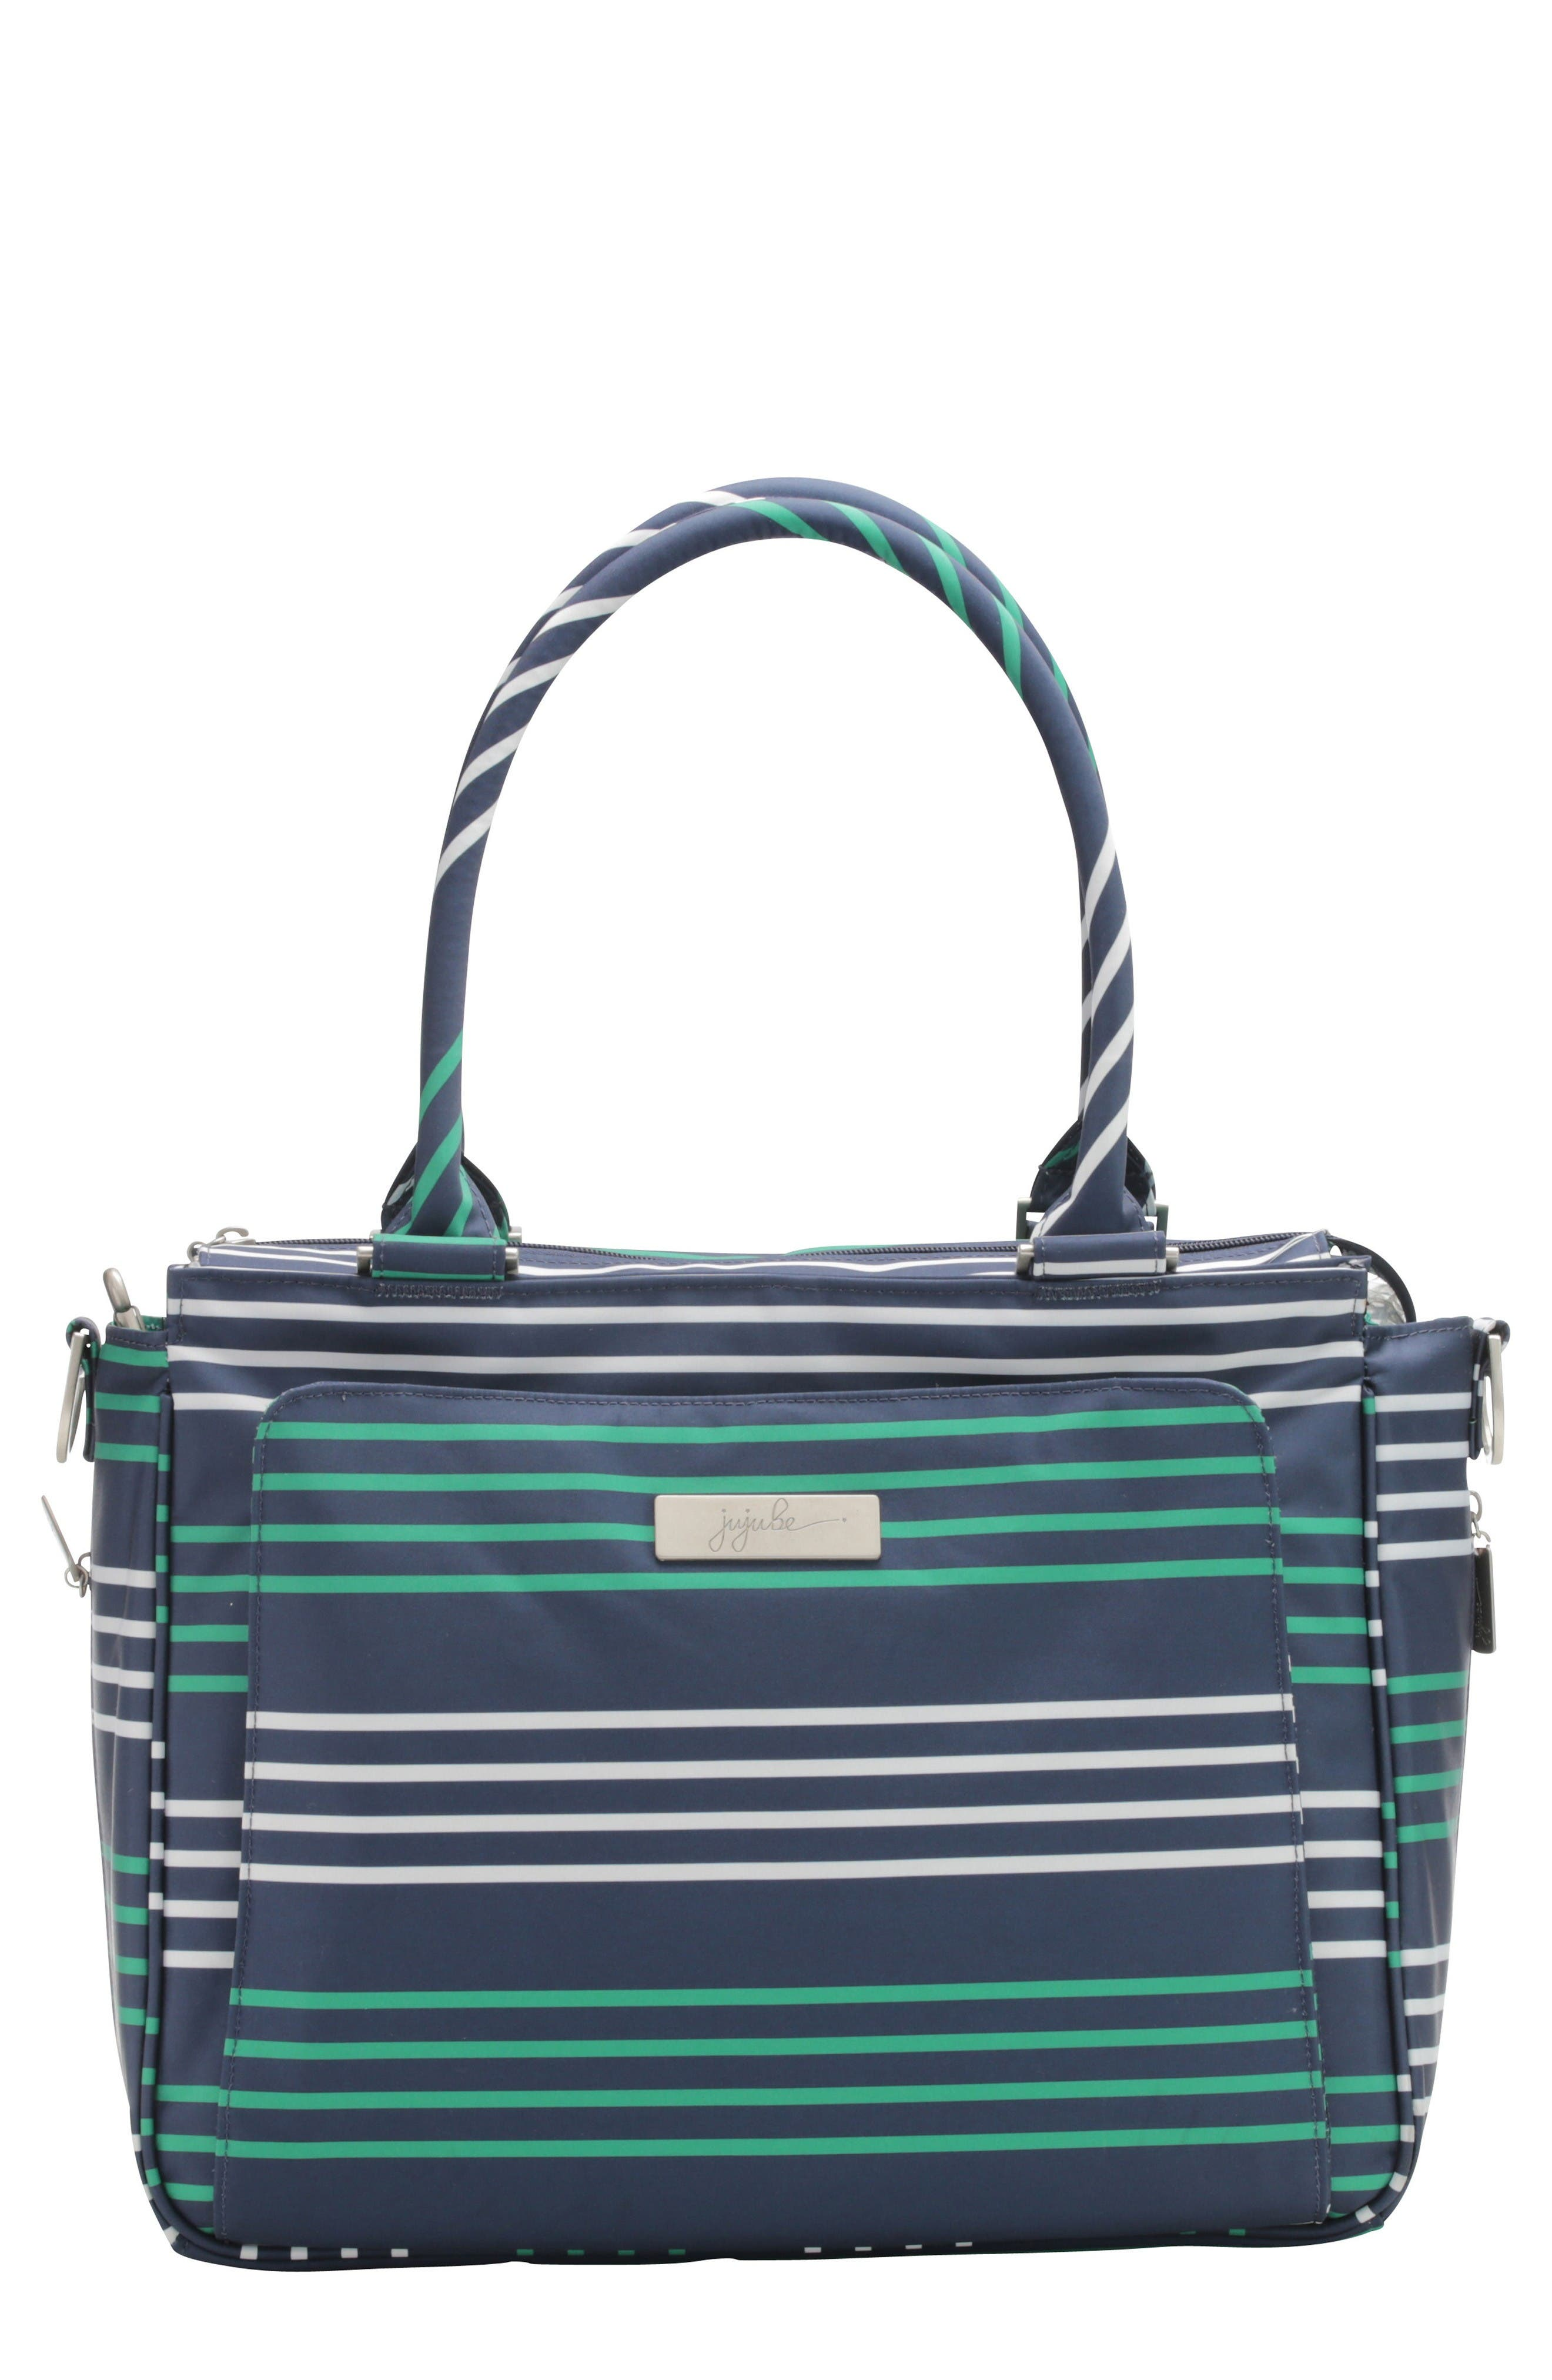 Main Image - Ju-Ju-Be Be Classy - Coastal Collection Diaper Bag